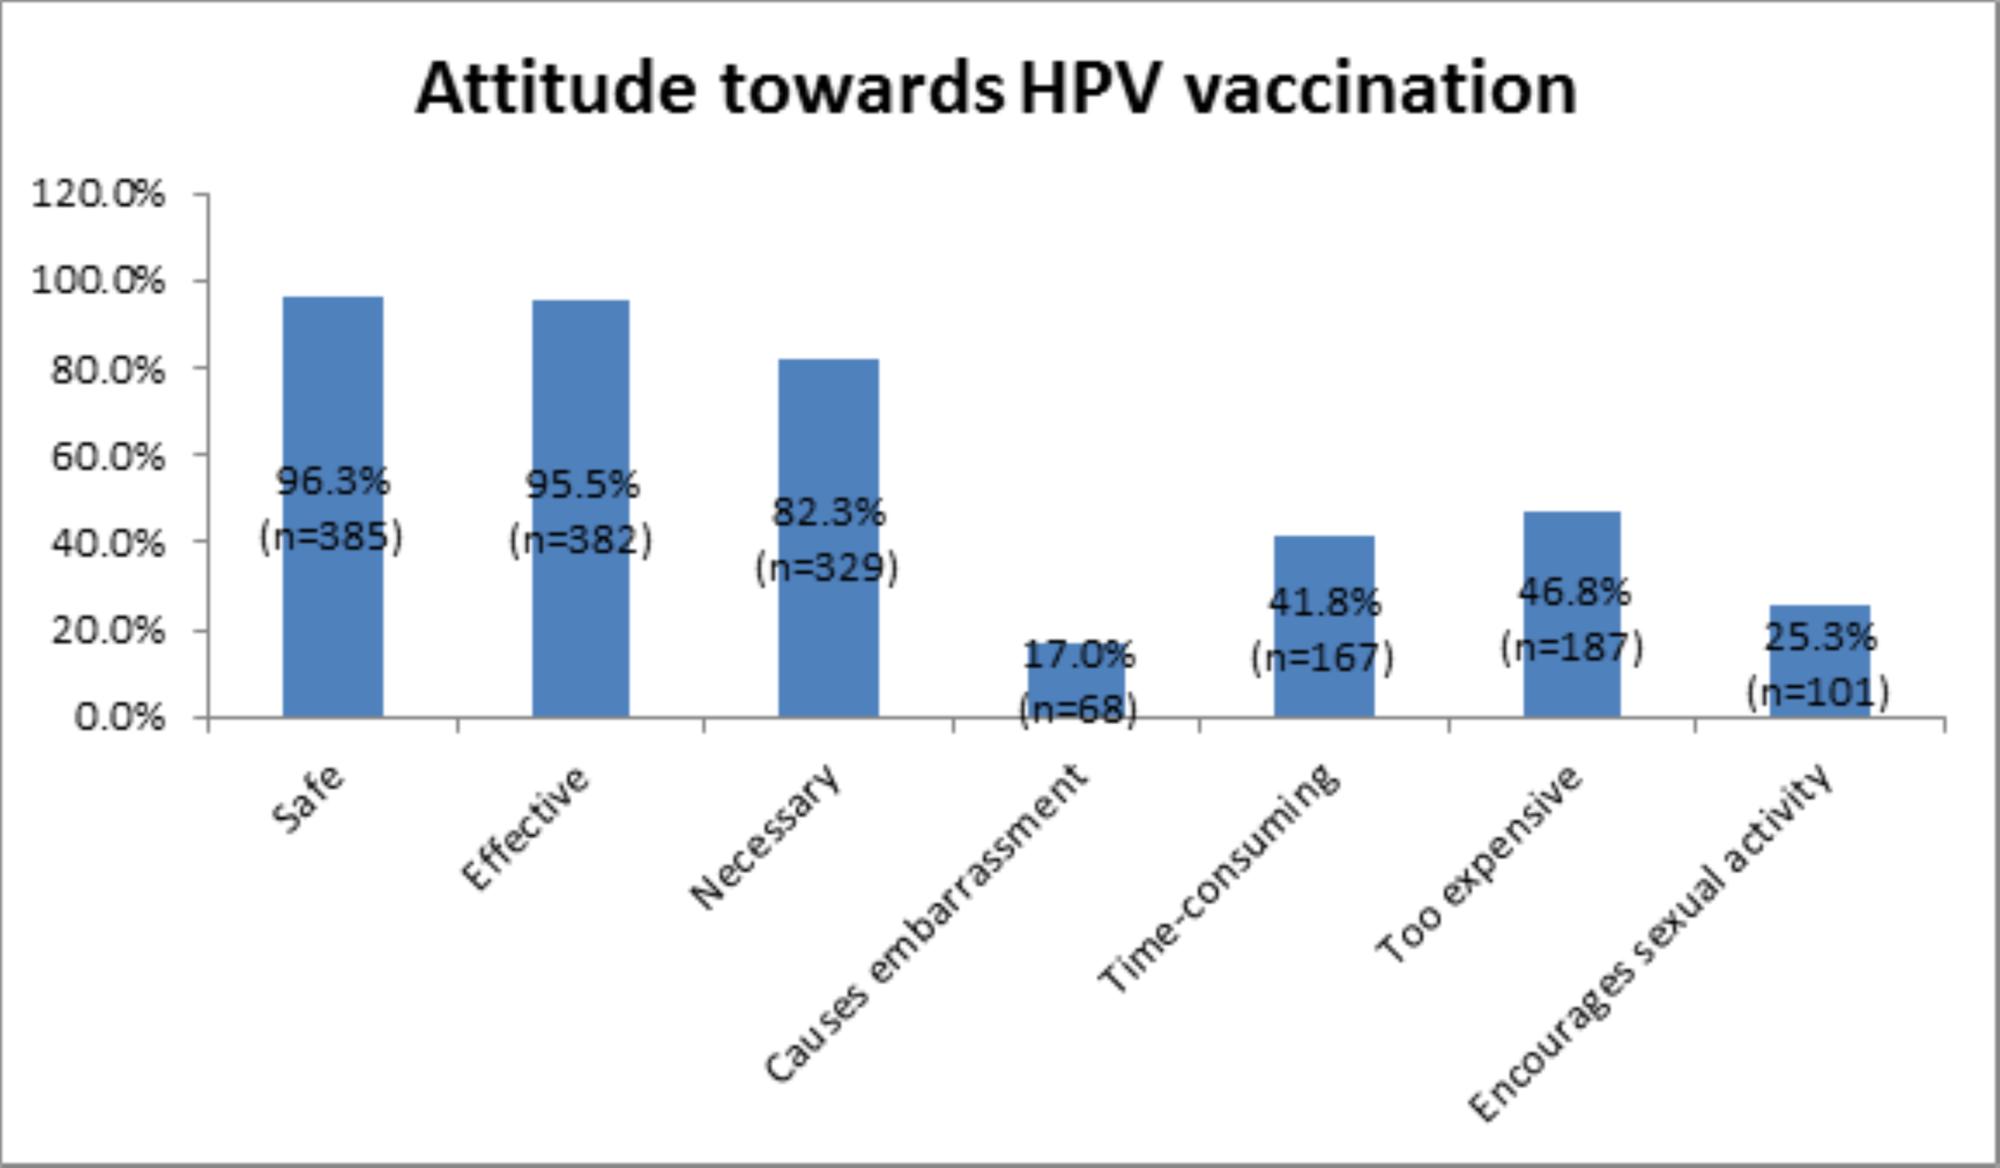 public knowledge and attitudes towards human papillomavirus (hpv) vaccination